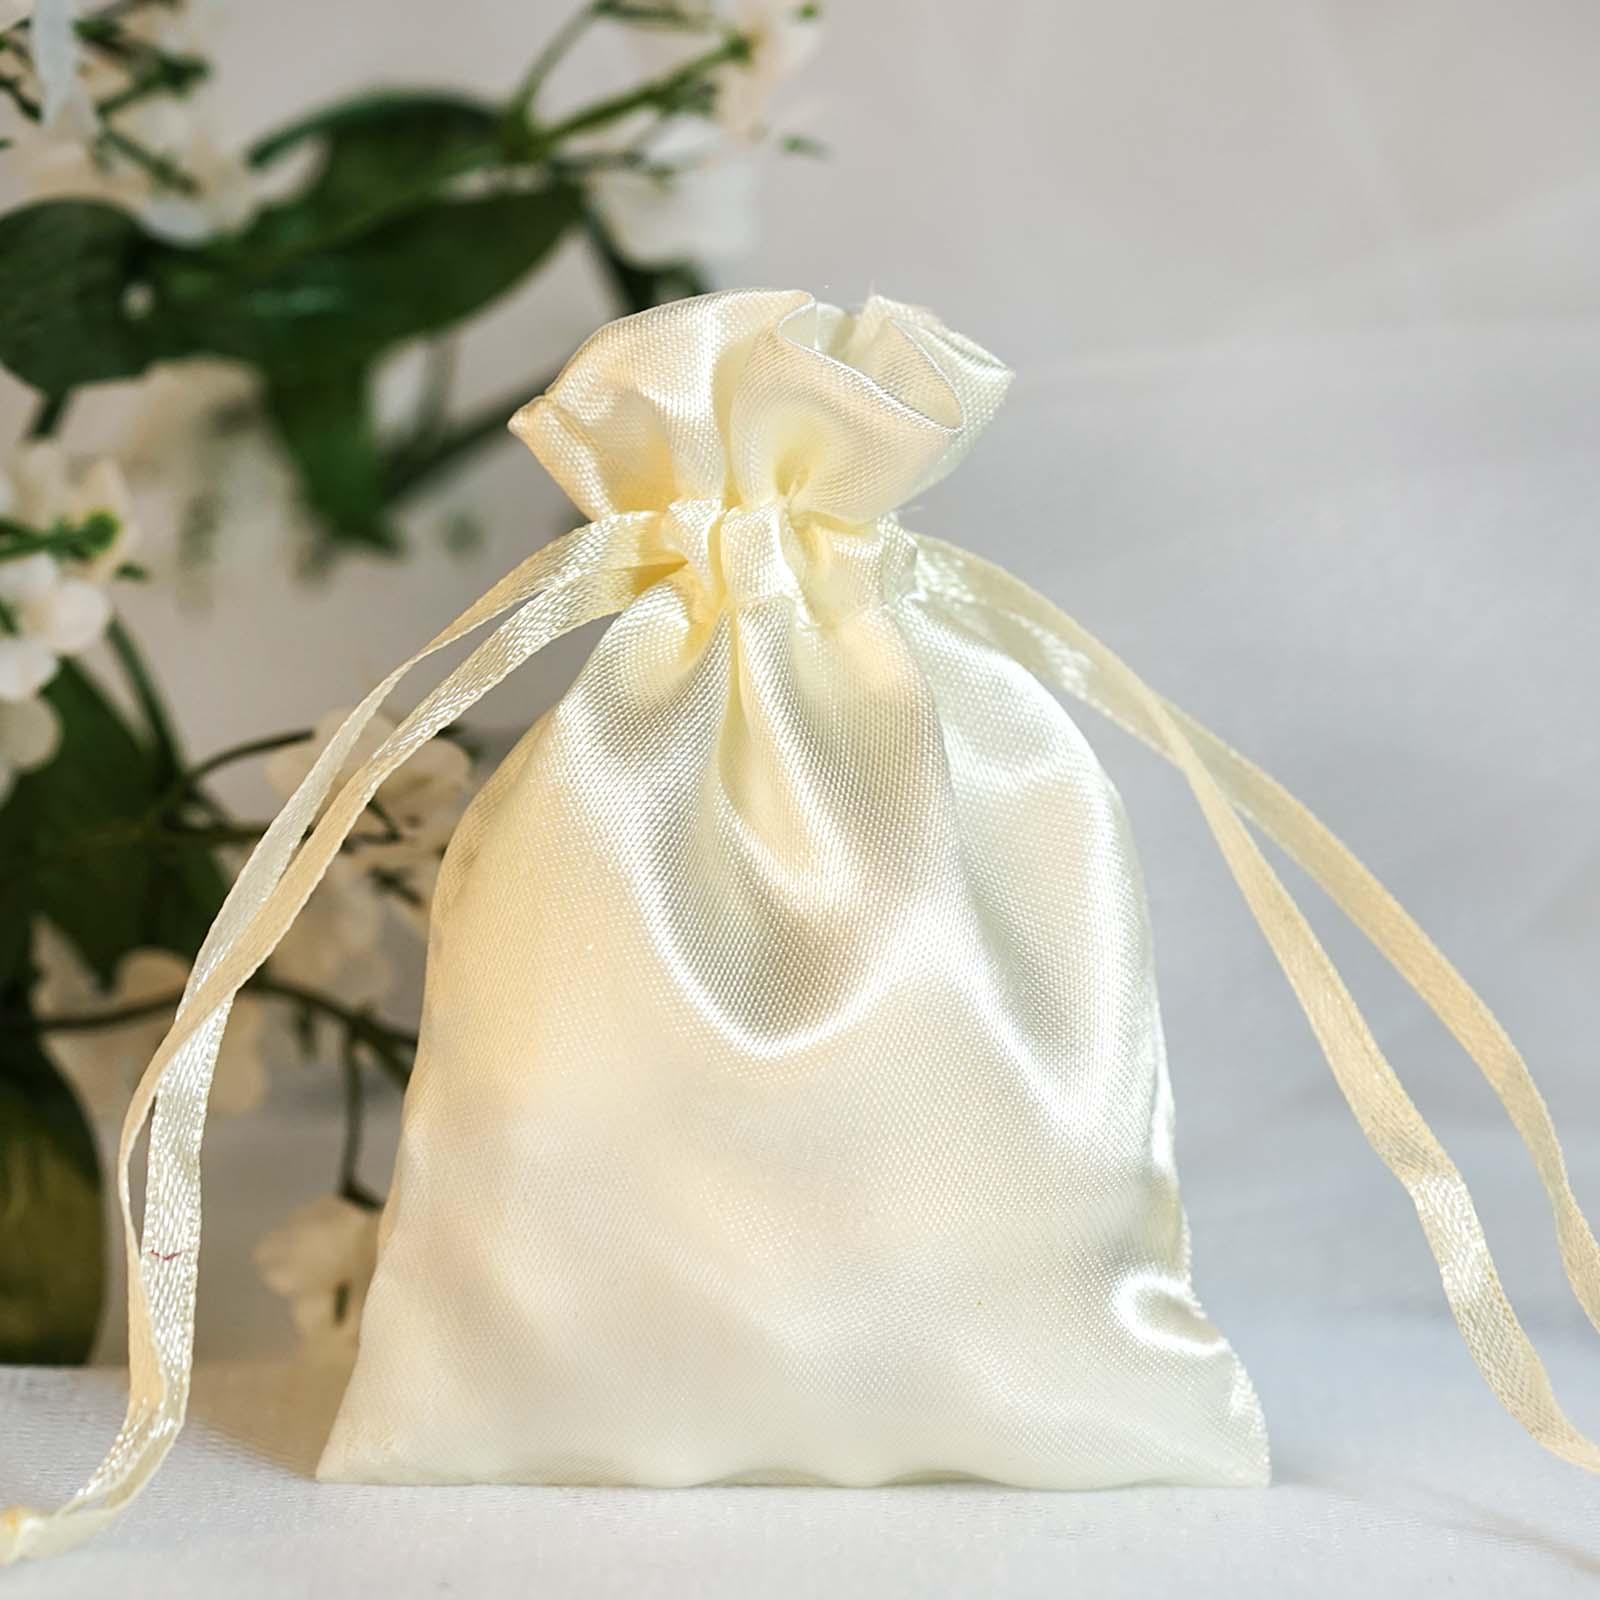 60 pcs 3x3 5 inch satin drawstring favor bags wedding gift pouches